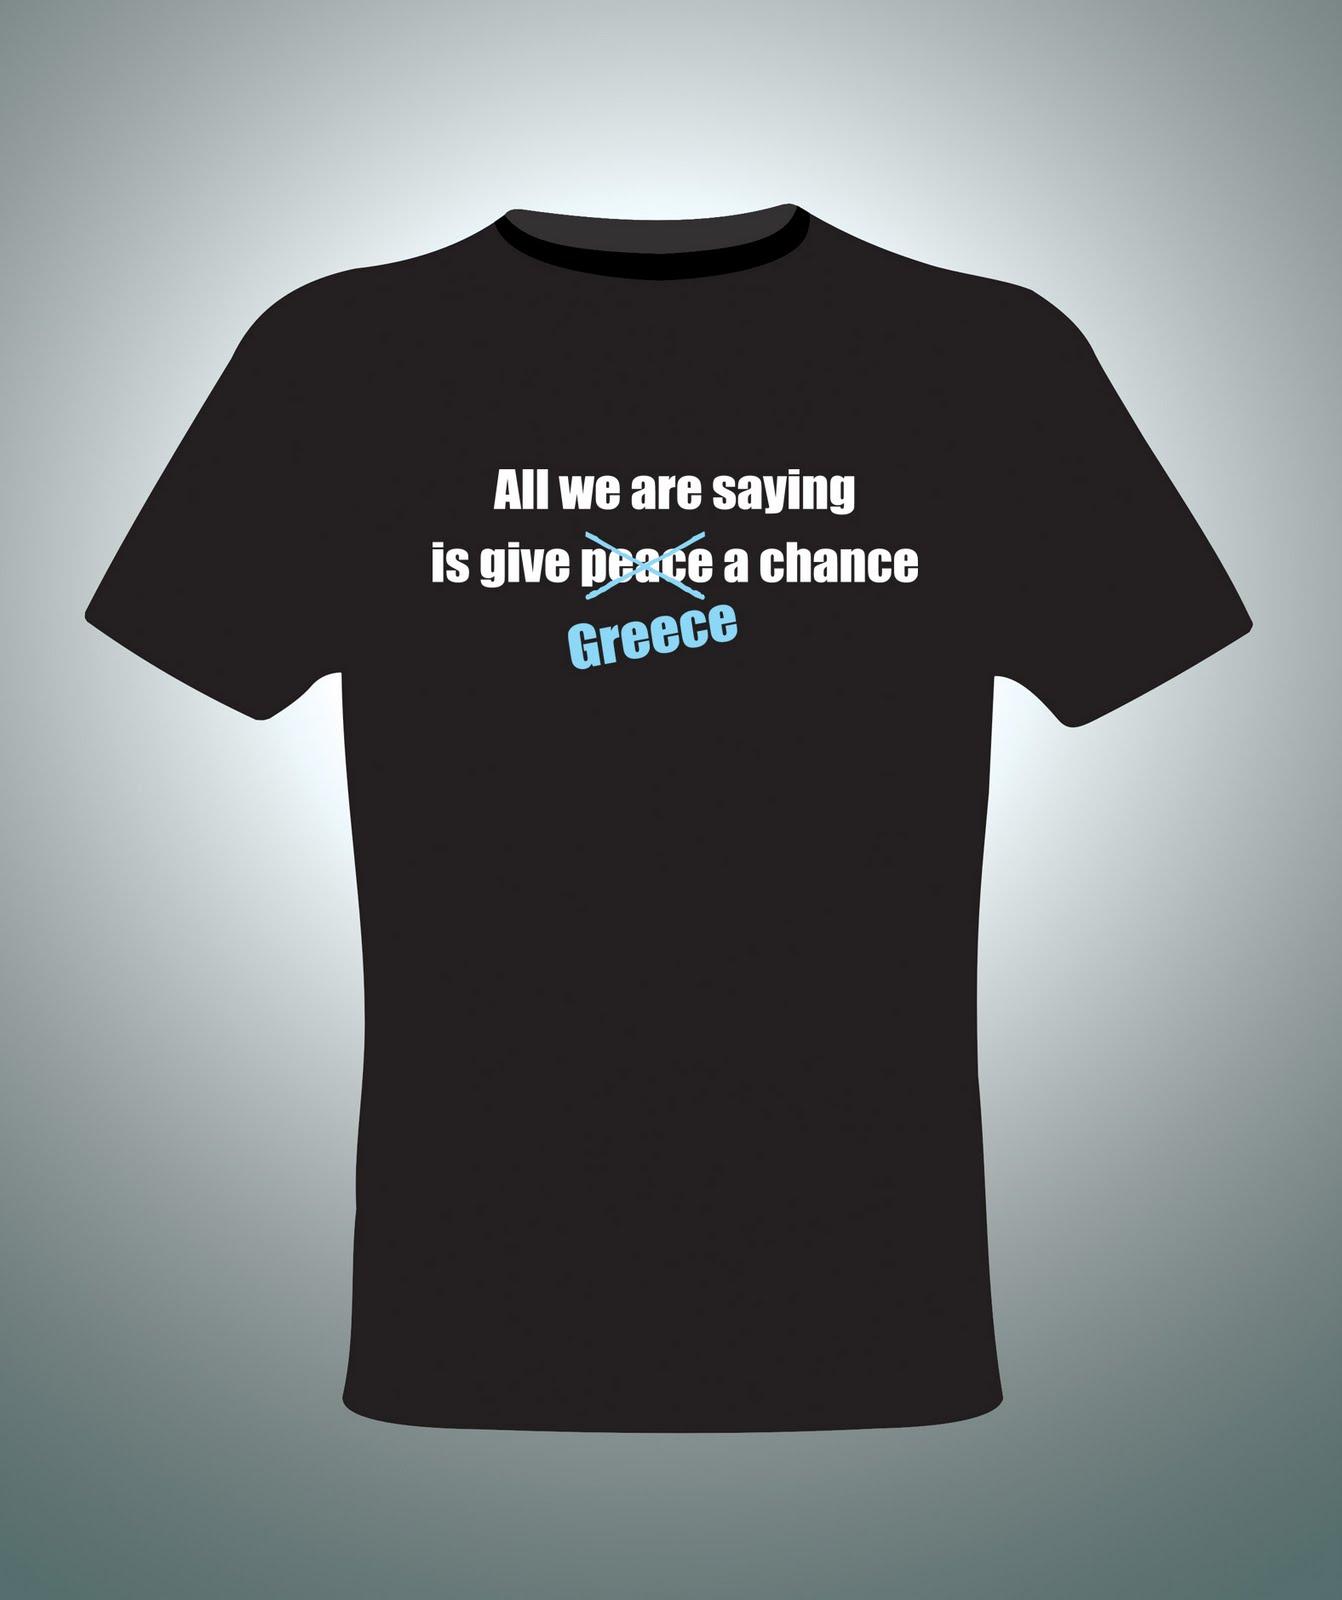 http://2.bp.blogspot.com/-n3KDus2ggiQ/Tm4-gQffodI/AAAAAAAAADw/42qgwvMvGKY/s1600/give+Greece+a+chance.jpg